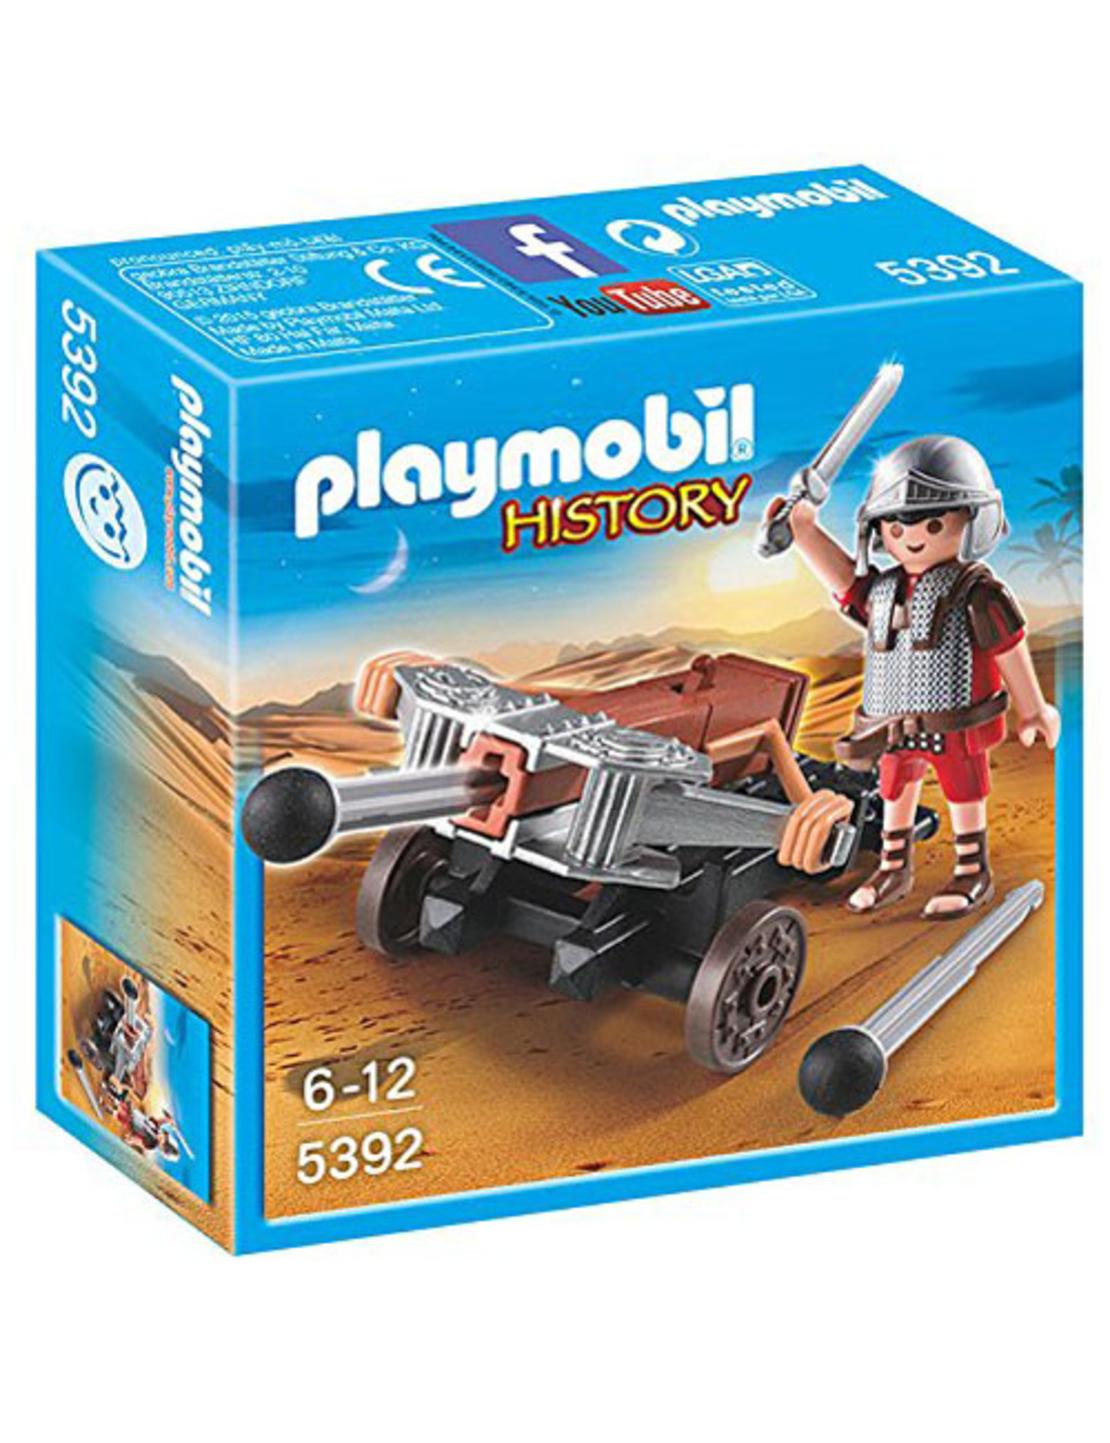 פליימוביל 5392 - לגיונר עם בליסטרא